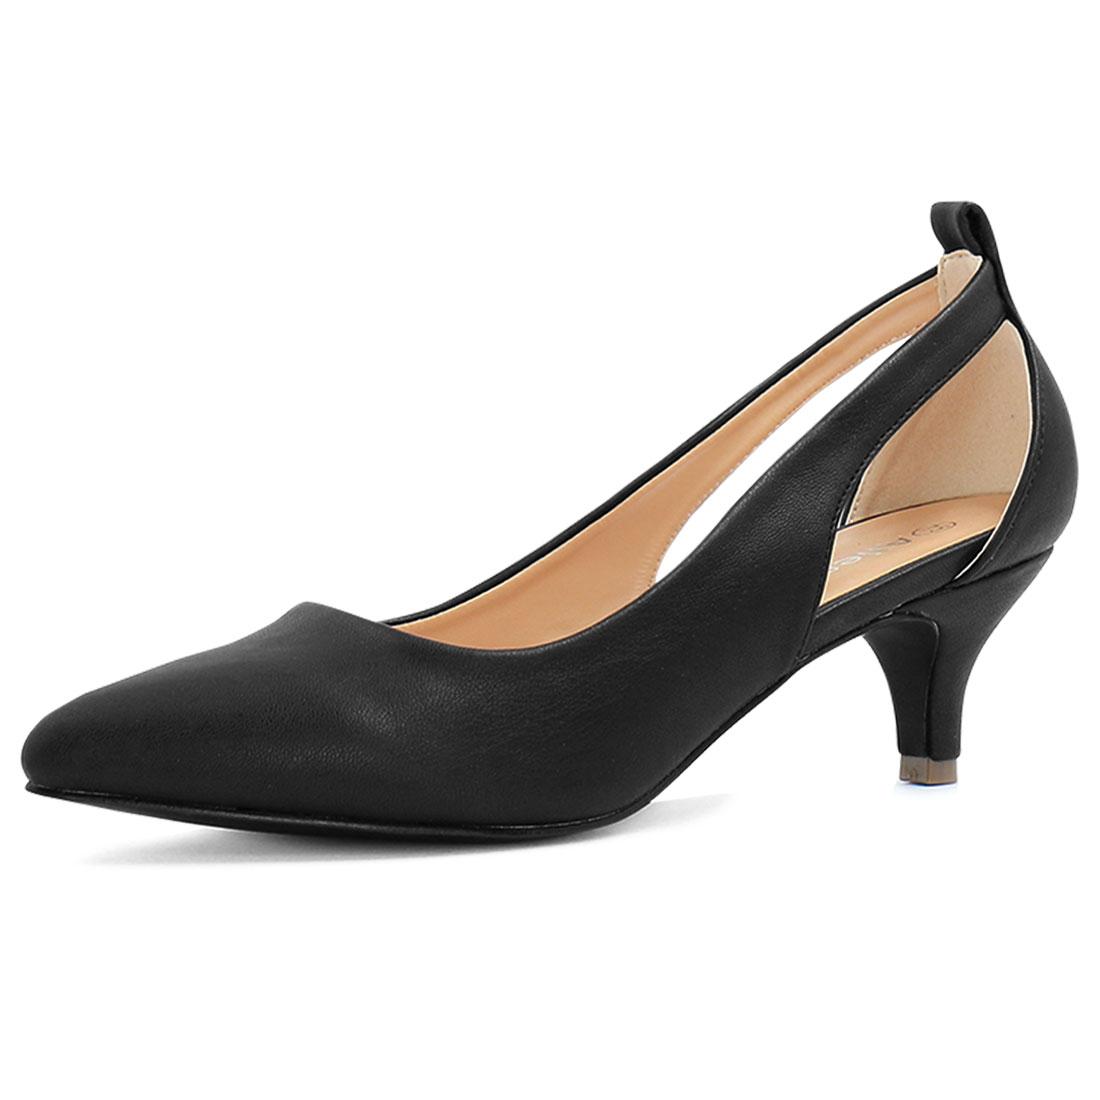 Allegra K Women's Cutout Sides Pointed Toe Kitten Heel Pumps Black US 9